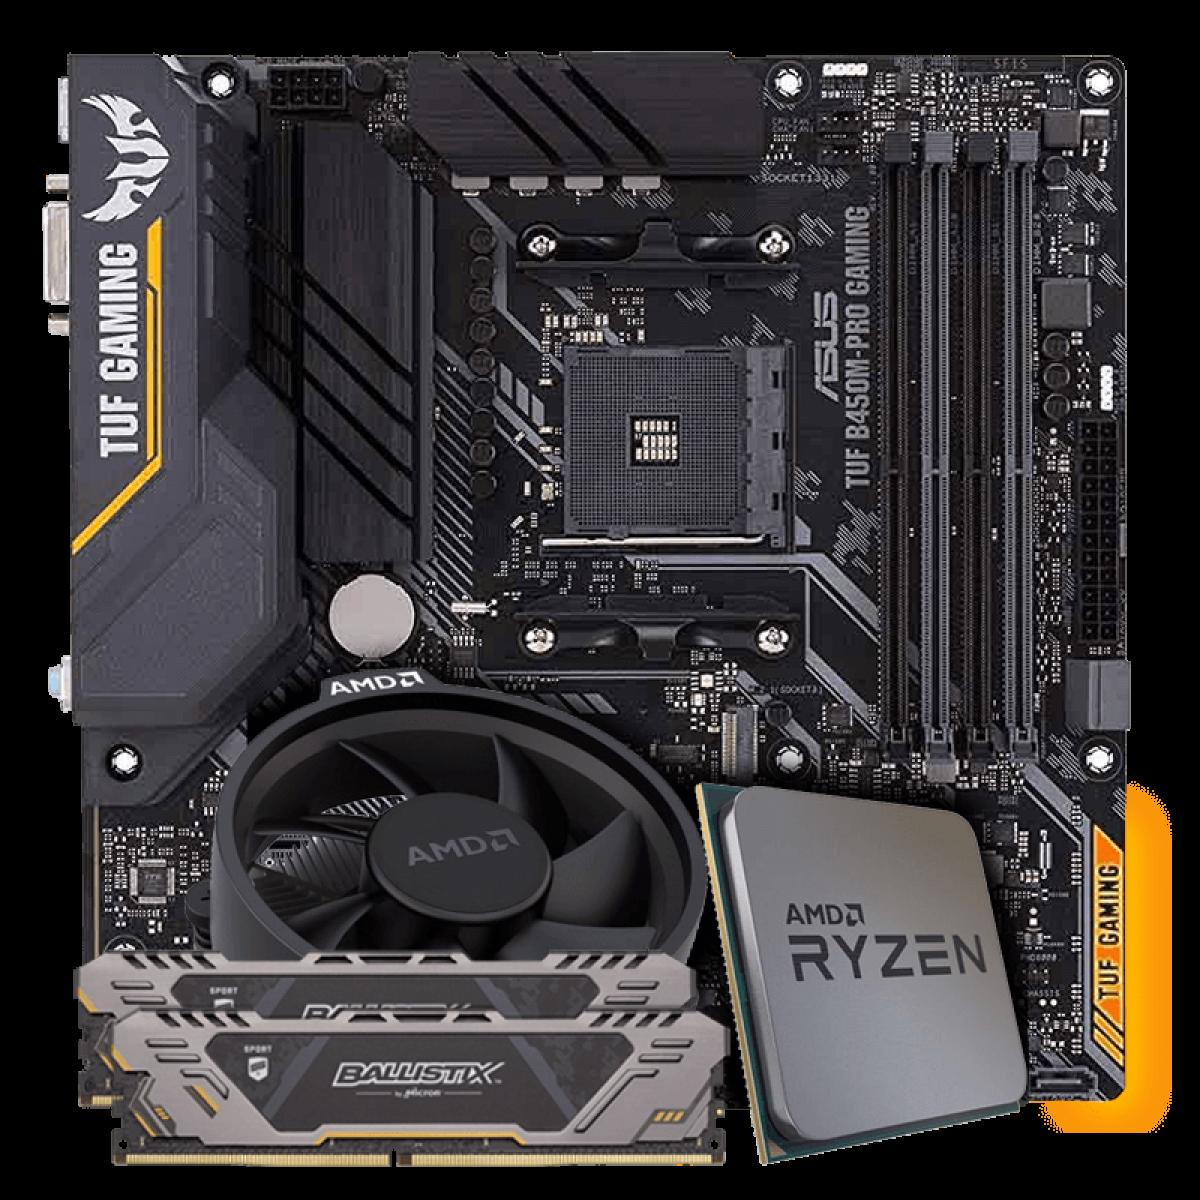 Kit Upgrade Placa Mãe Asus TUF B450M-PRO GAMING DDR4 + Processador AMD Ryzen 5 2600X 3.6GHz + Memória DDR4 Crucial Ballistix Sport TUF Edition 16GB (2X8GB) 2666MHz